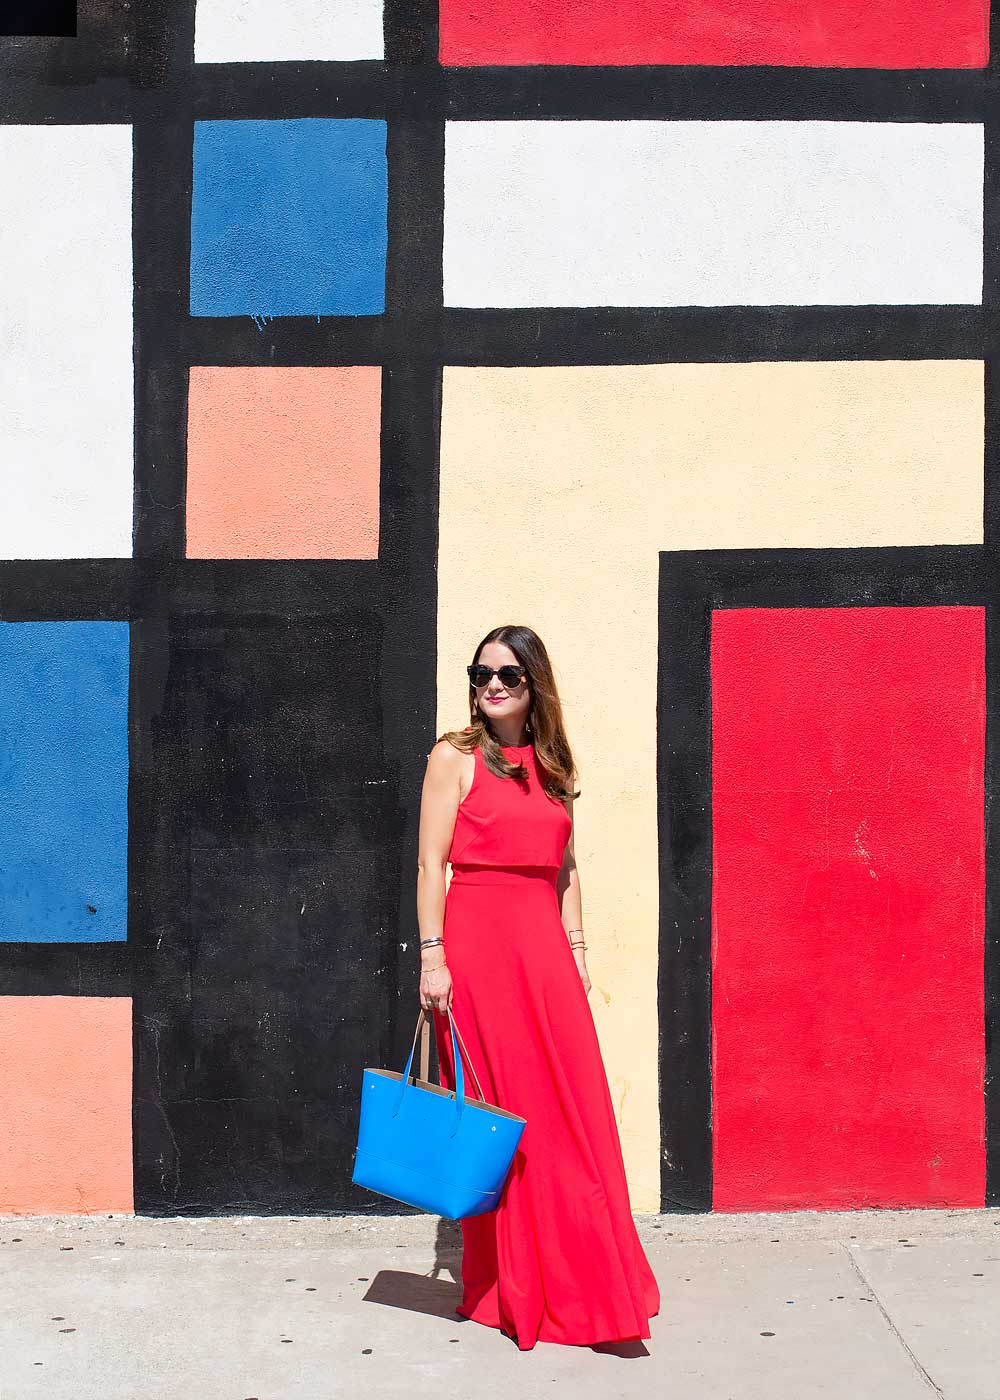 Los Angeles Mondrian Mural Wall